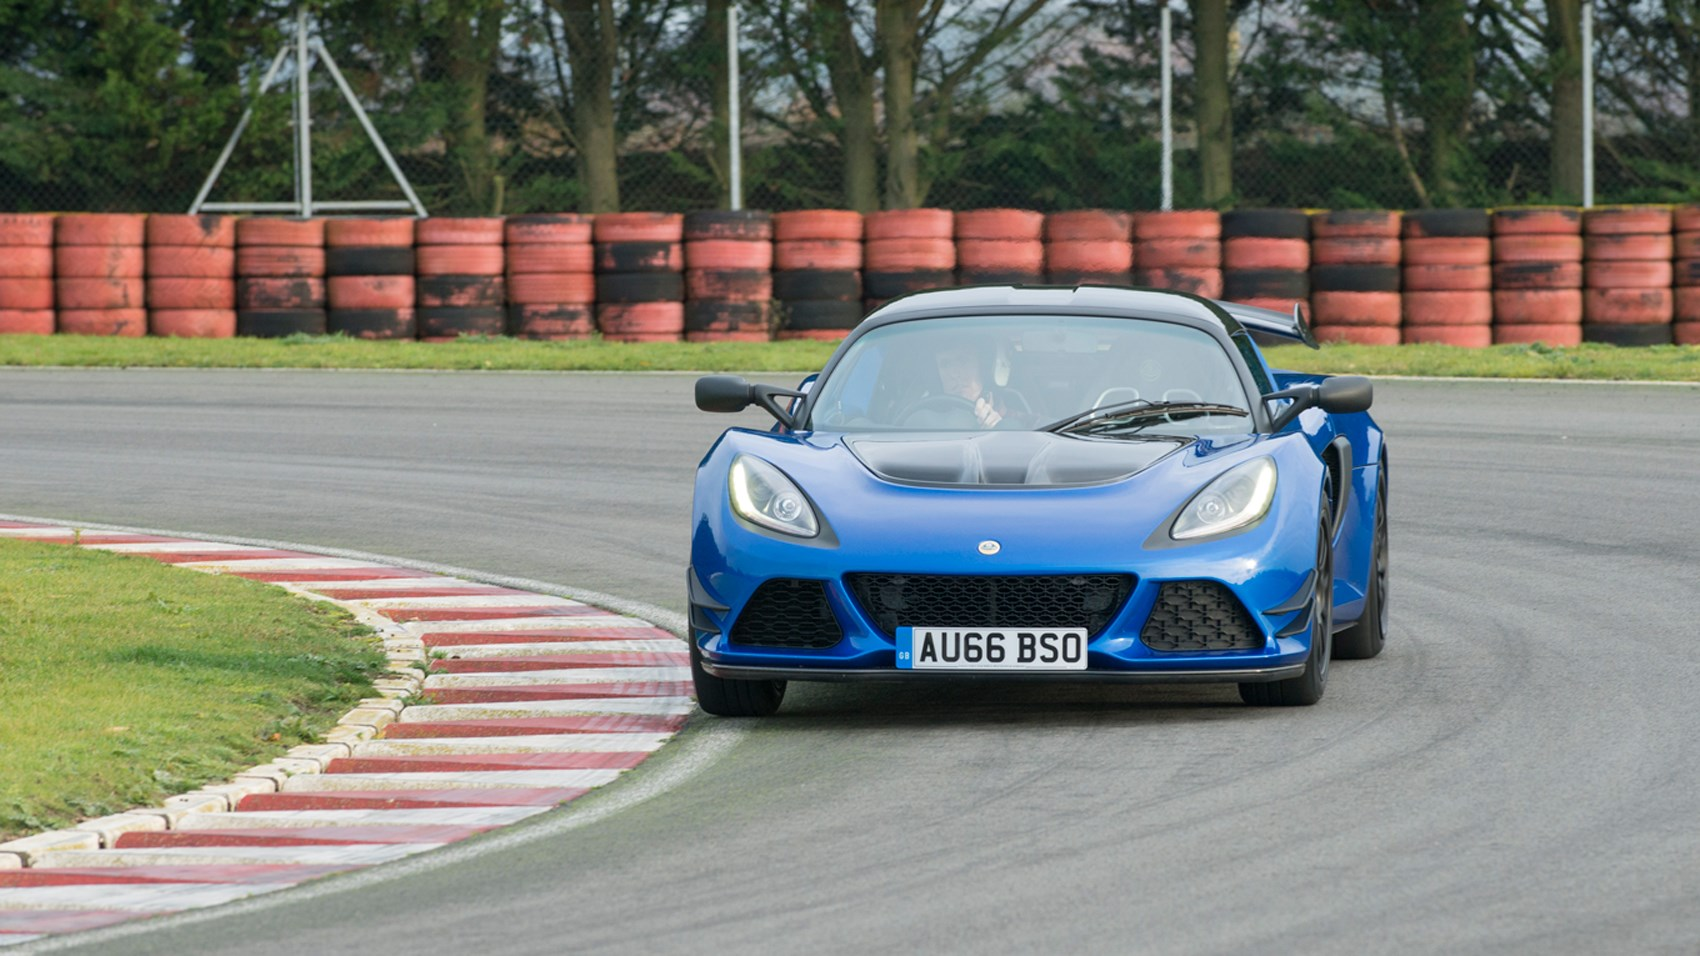 https://www.carmagazine.co.uk/Images/PageFiles/68250/Exige05.jpg